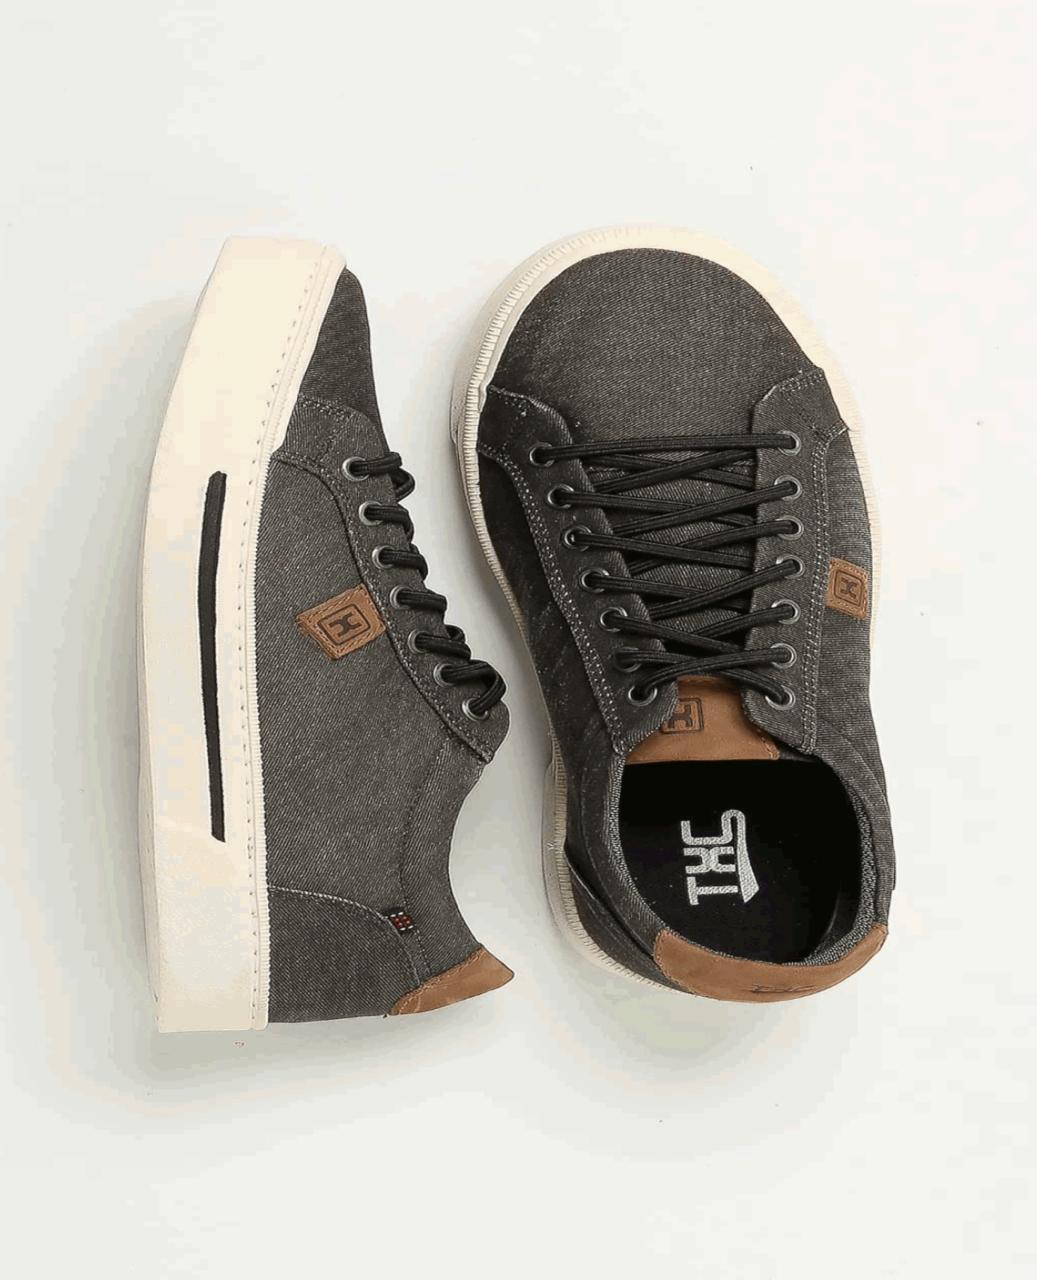 Tênis X-Shoes Cover Masculino Txc Lona e Borracha Liso - Cinza Escuro